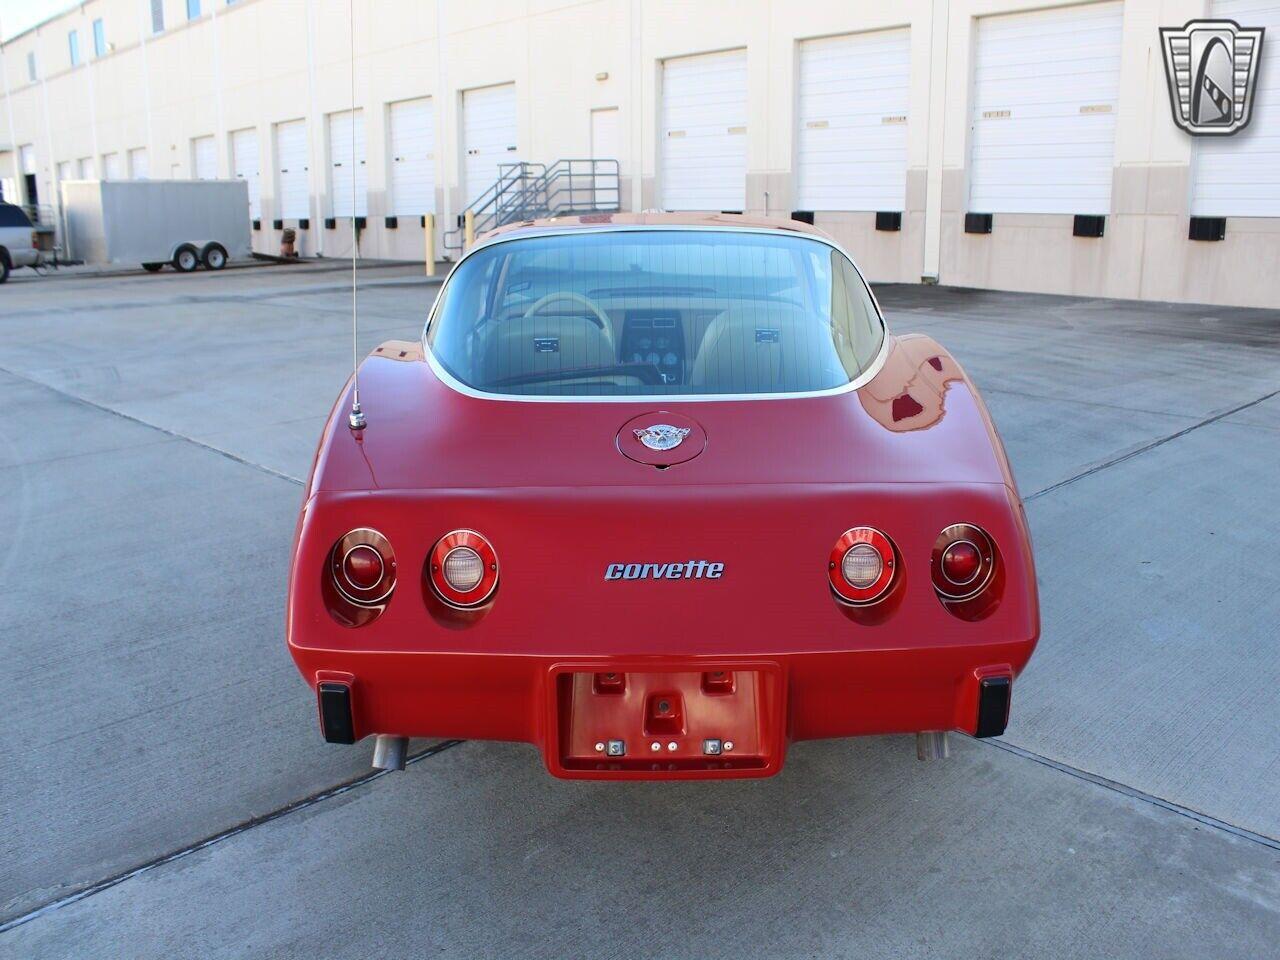 1978 Red Chevrolet Corvette   | C3 Corvette Photo 4